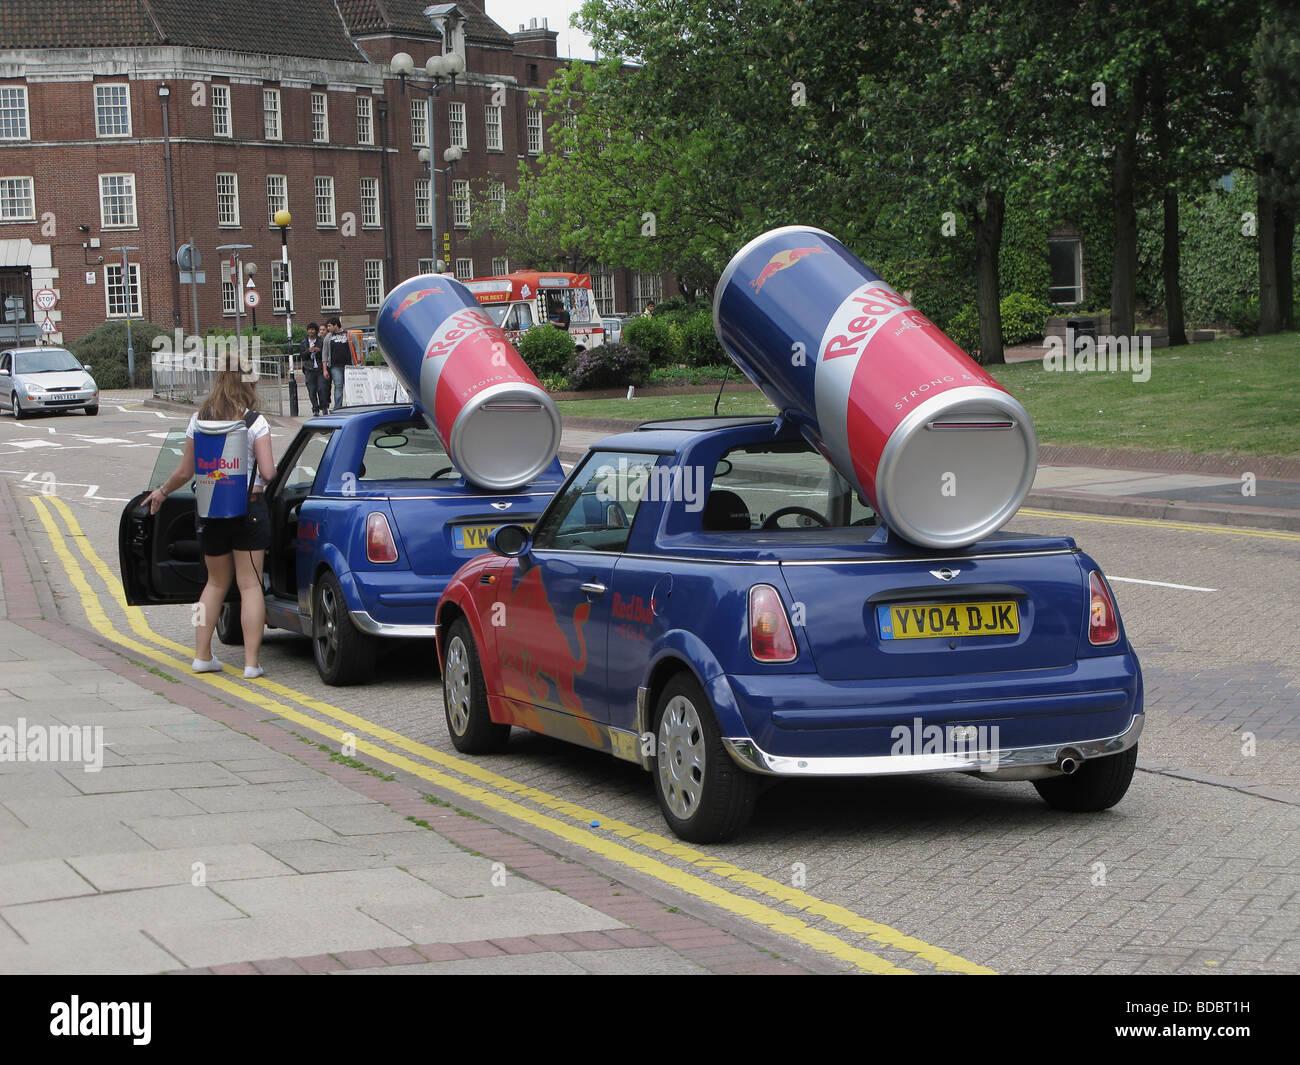 Red Bull Kühlschrank Silber : Cans energy drink red bull stockfotos cans energy drink red bull